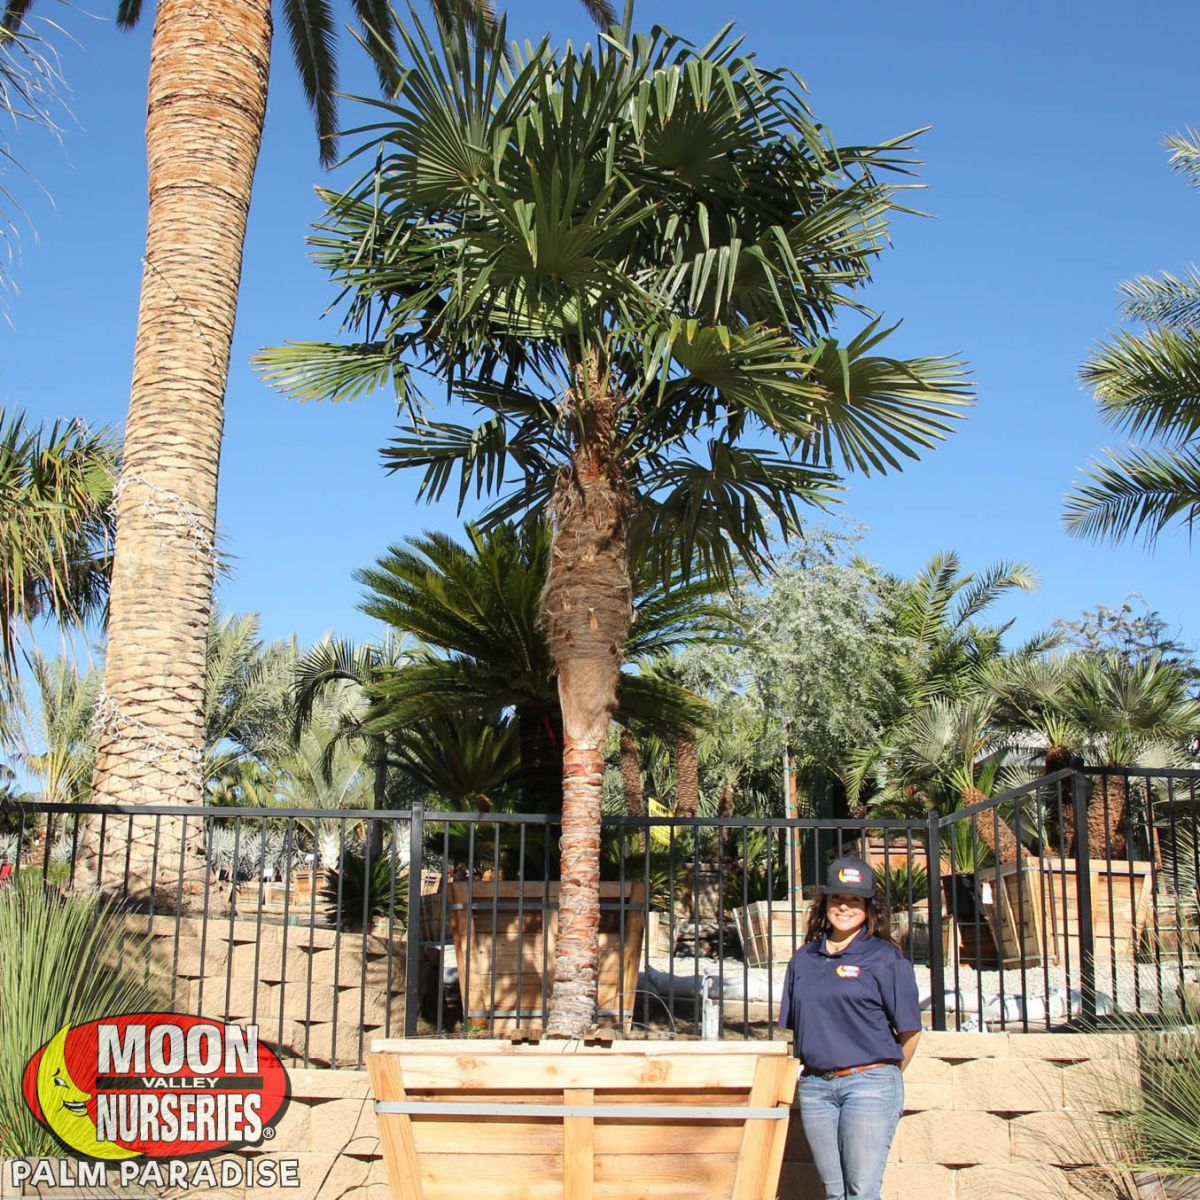 Windmill Palm Palm Tree Palm Paradise Nursery